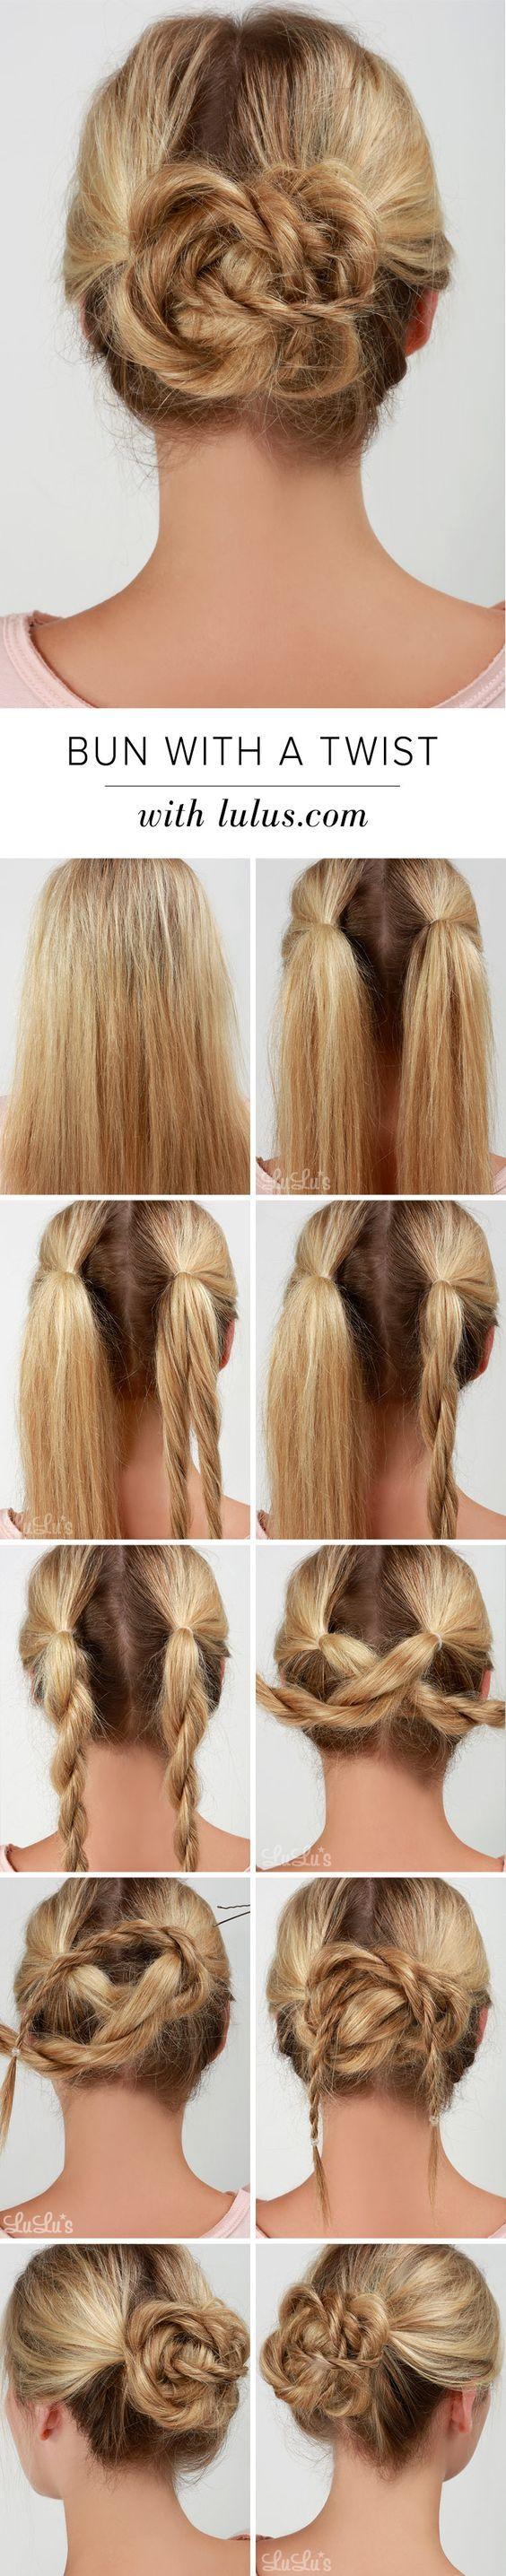 Enjoyable Easy Bun Hairstyles Easy Bun And Bun Hairstyles On Pinterest Hairstyles For Men Maxibearus